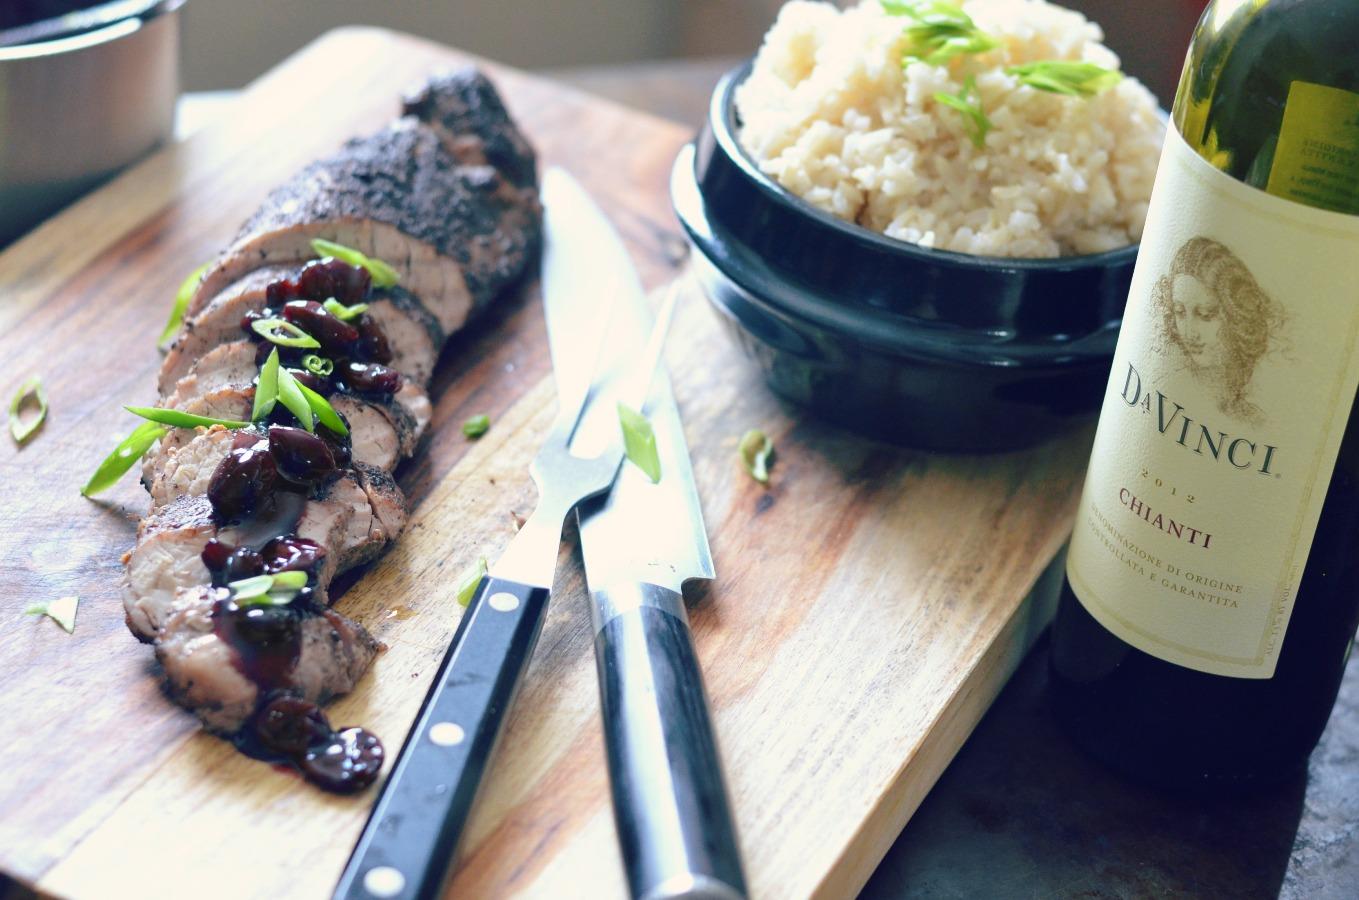 Allspiced Rubbed Pork Tenderloin with an Asian Cherry Glaze over Coconut Rice